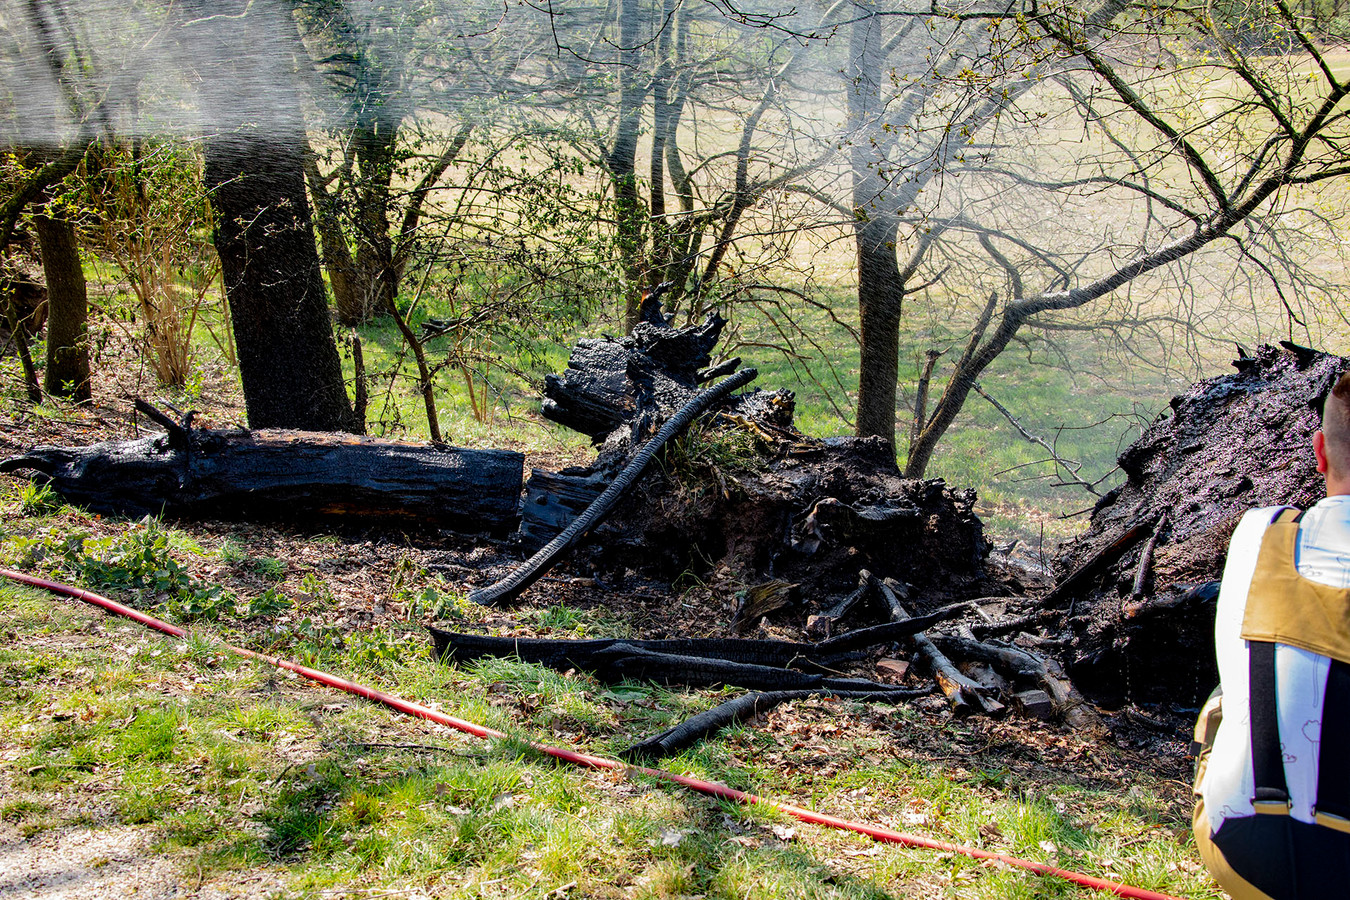 Boomstronk in brand in natuurgebied Oss